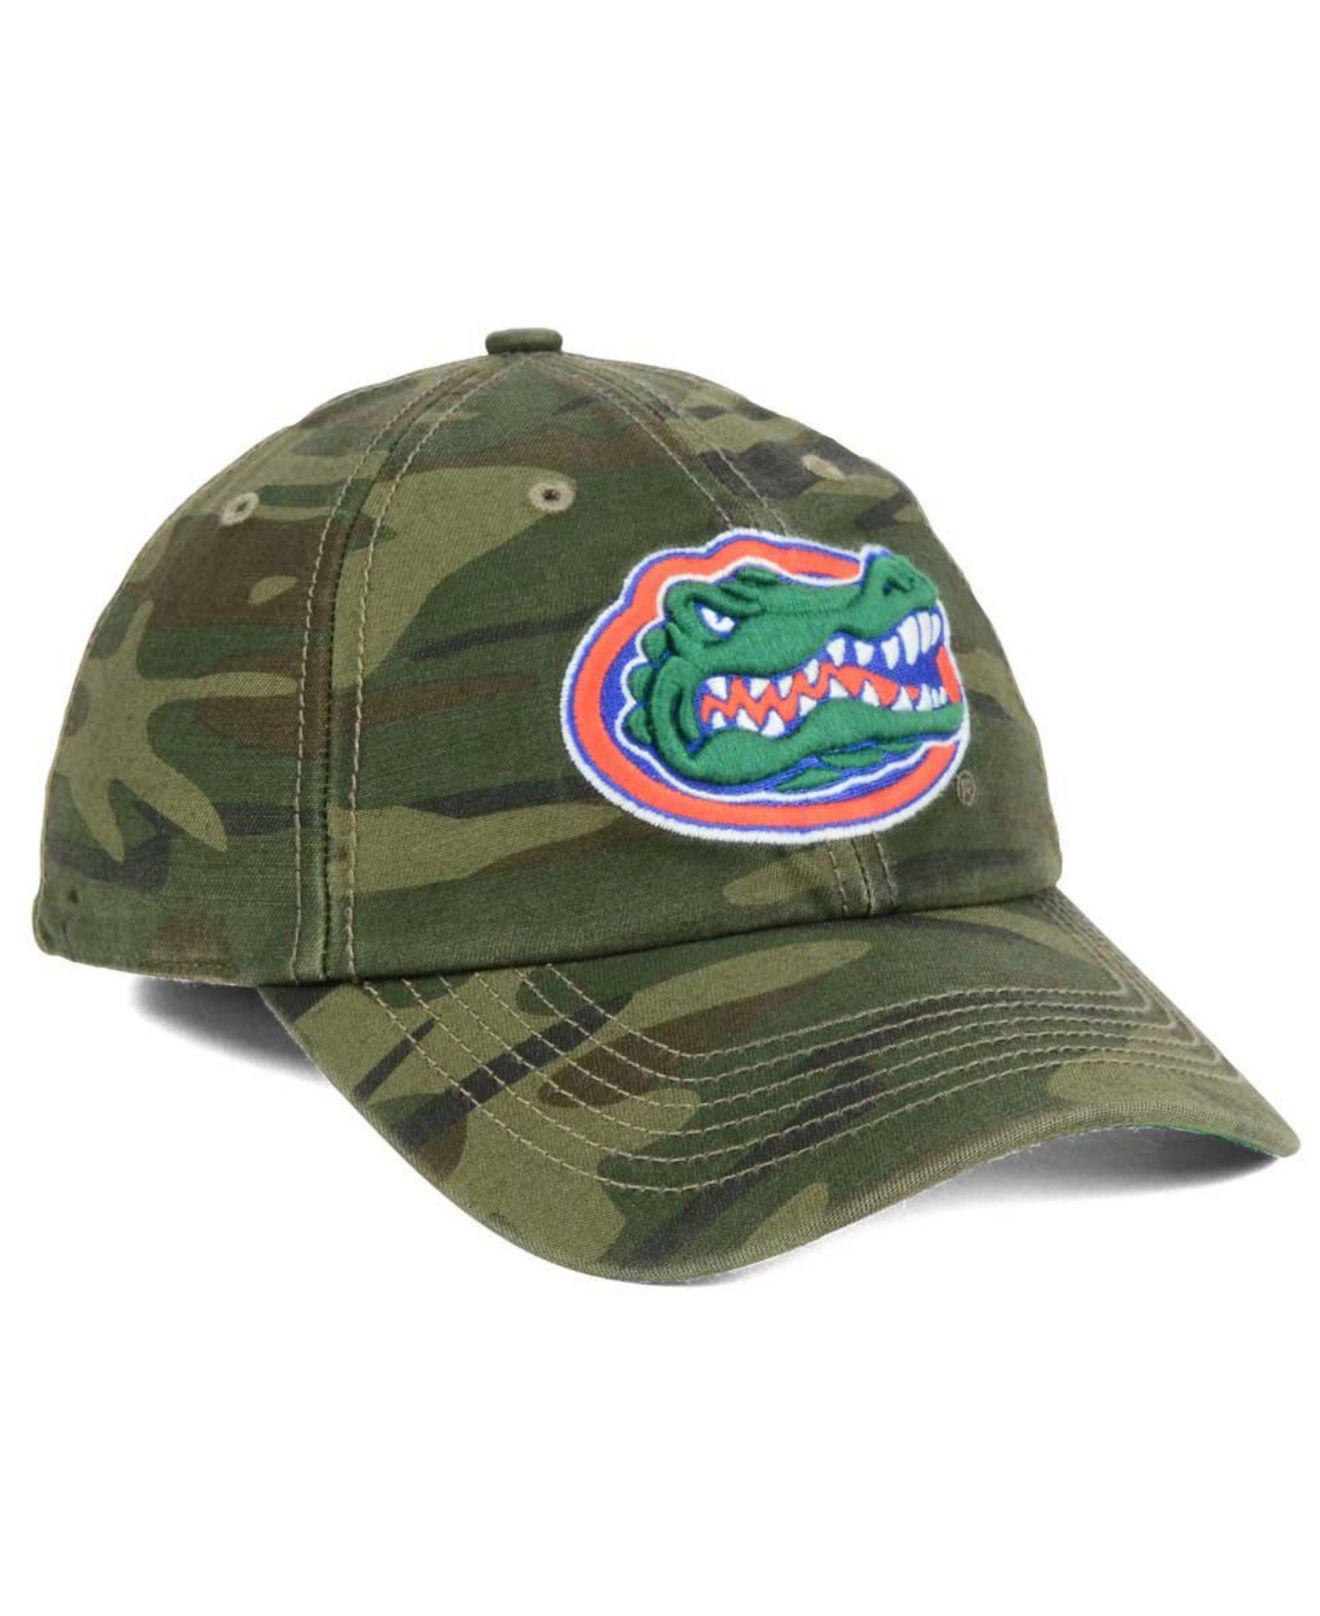 ecede8fcb9ddd ... new style lyst 47 brand florida gators harlan franchise cap in green  for men 3084b 381f3